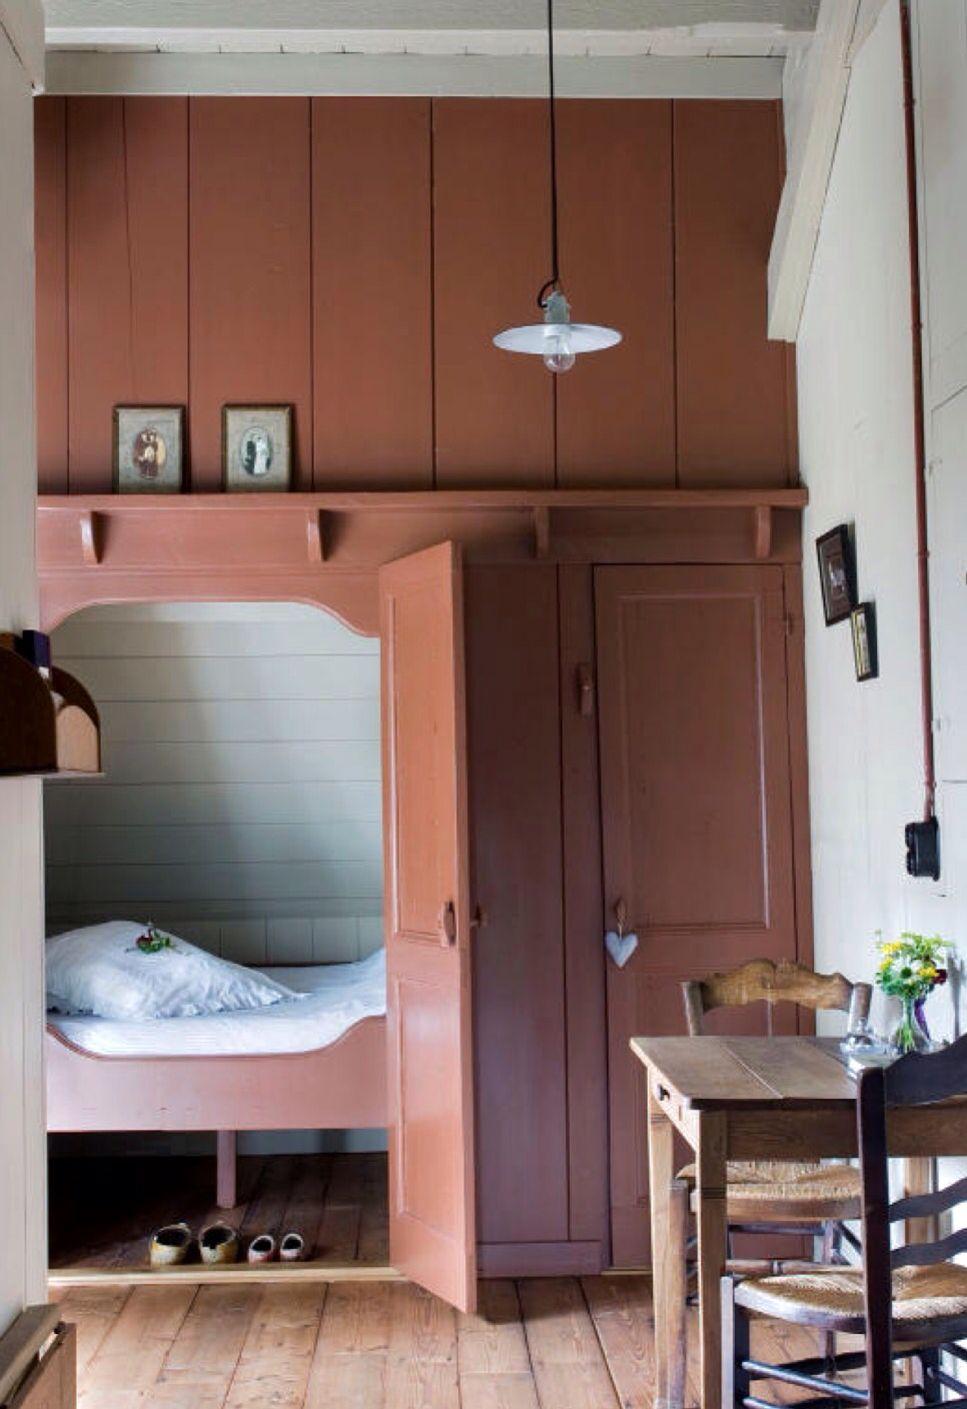 sleeping nook interior design + decorating ideas Bed